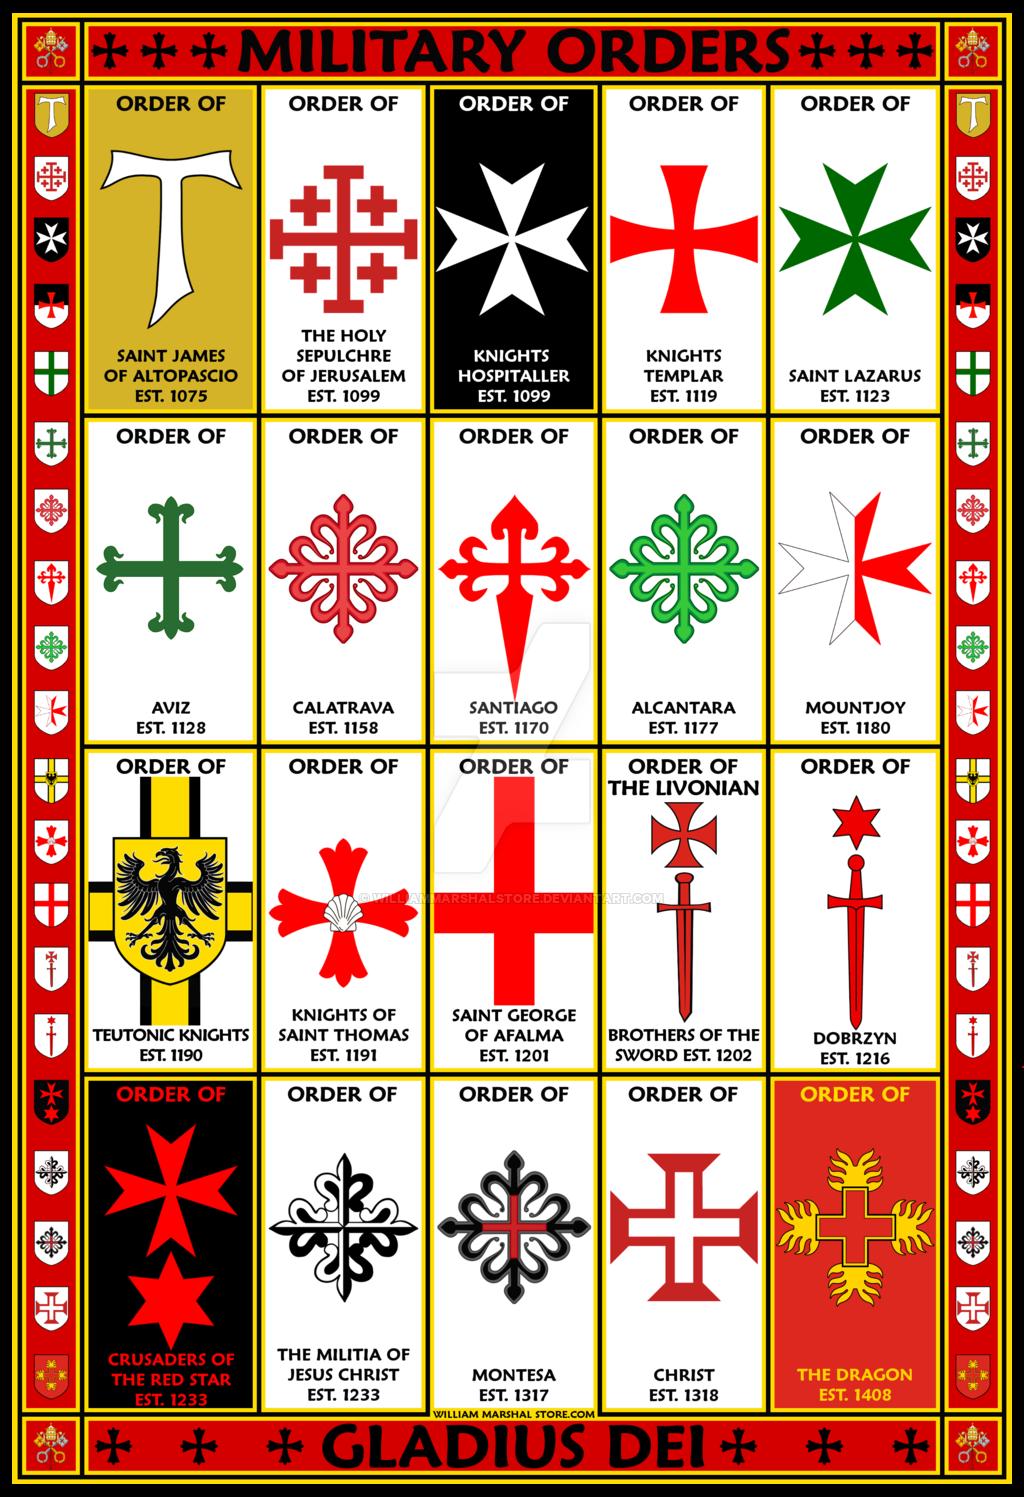 Military orders symbols poster by williammarshalstore on military orders symbols poster by williammarshalstore on deviantart buycottarizona